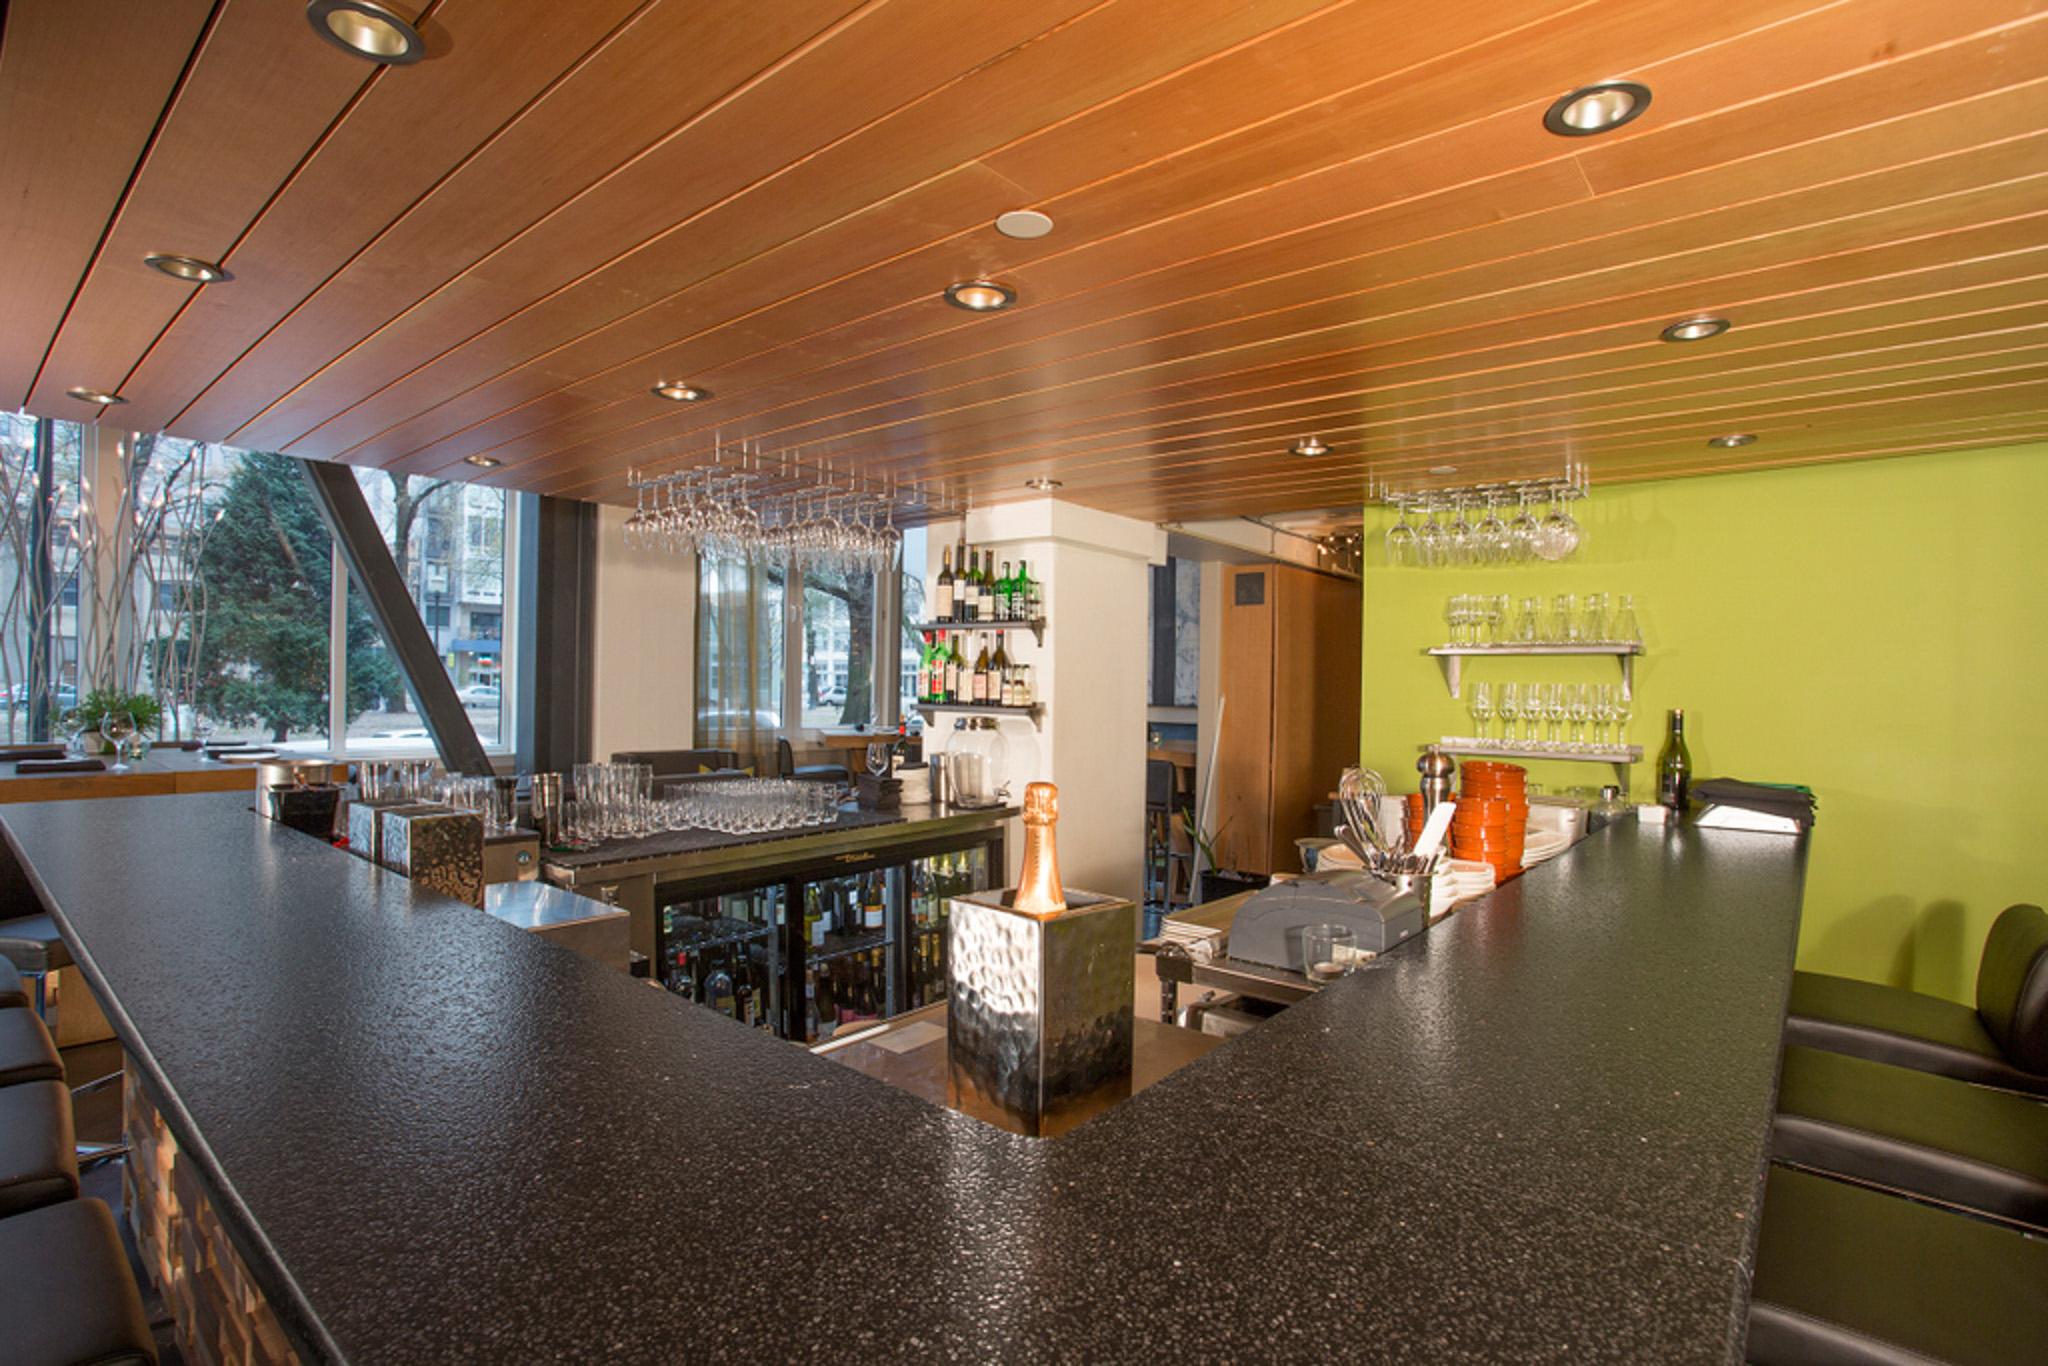 Lord Interior Design - North Park Blocks-7.jpg